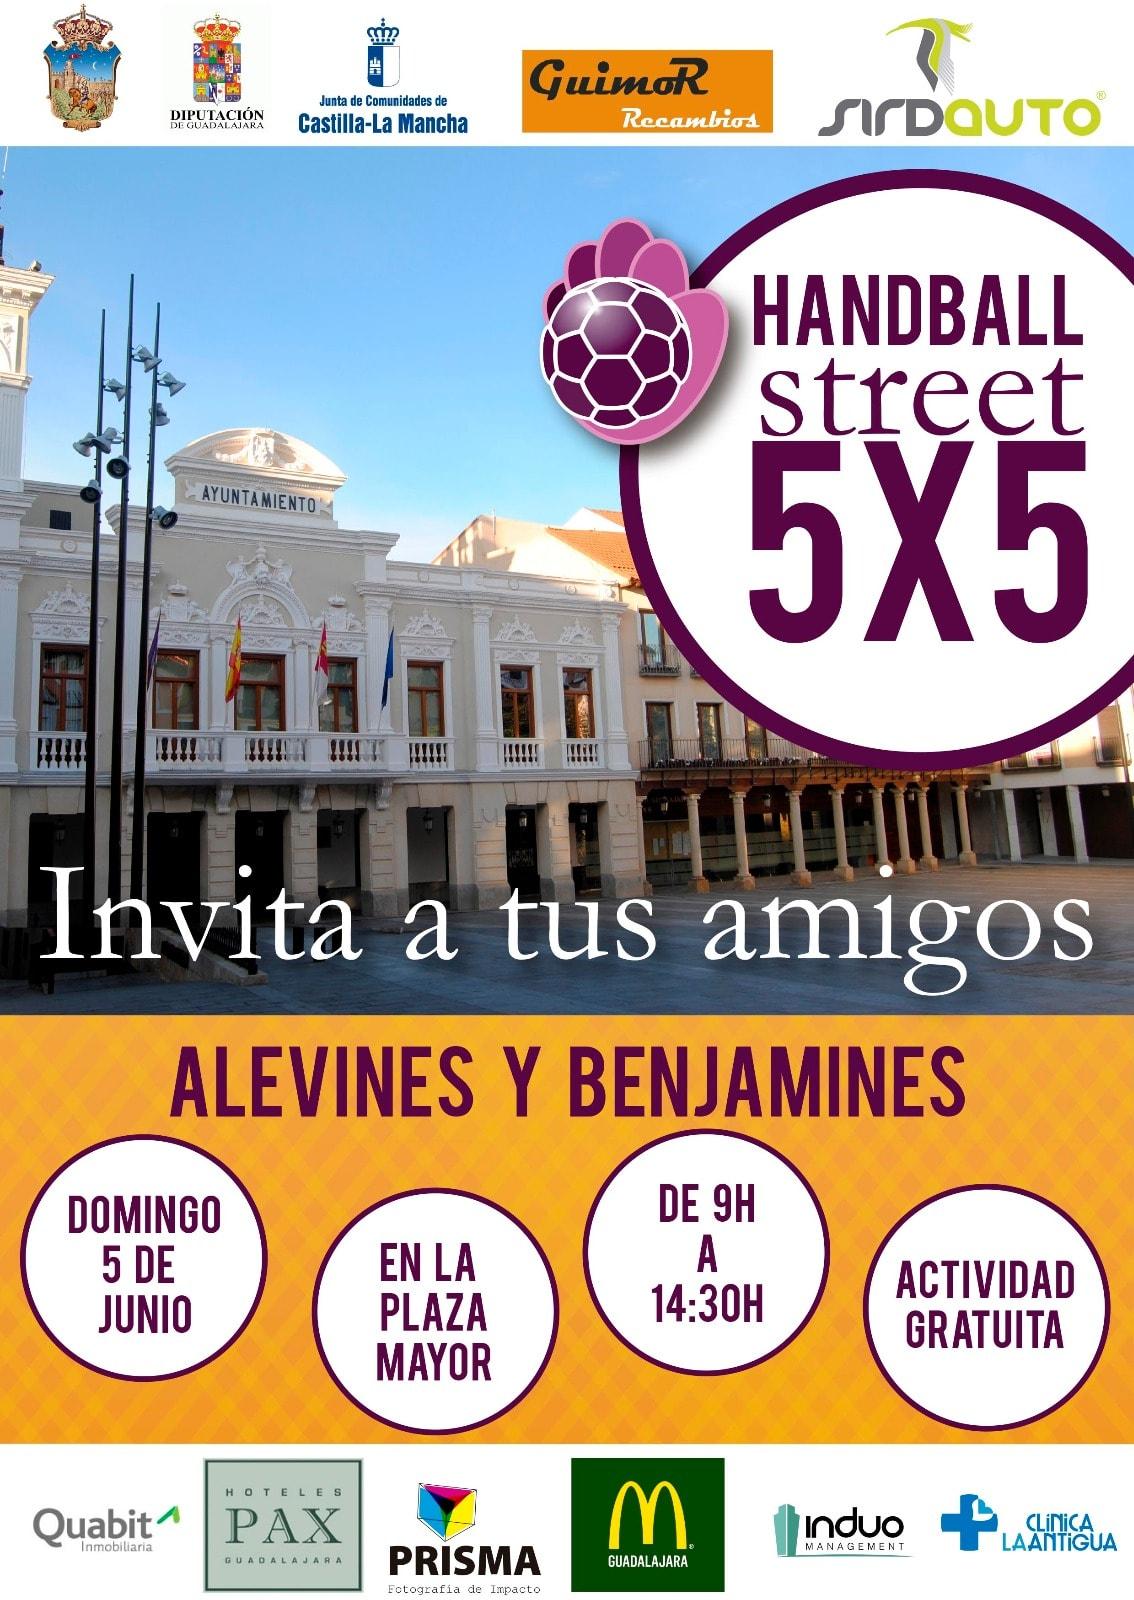 343 2016 Guadalajara Handball Street Spain5 Poster